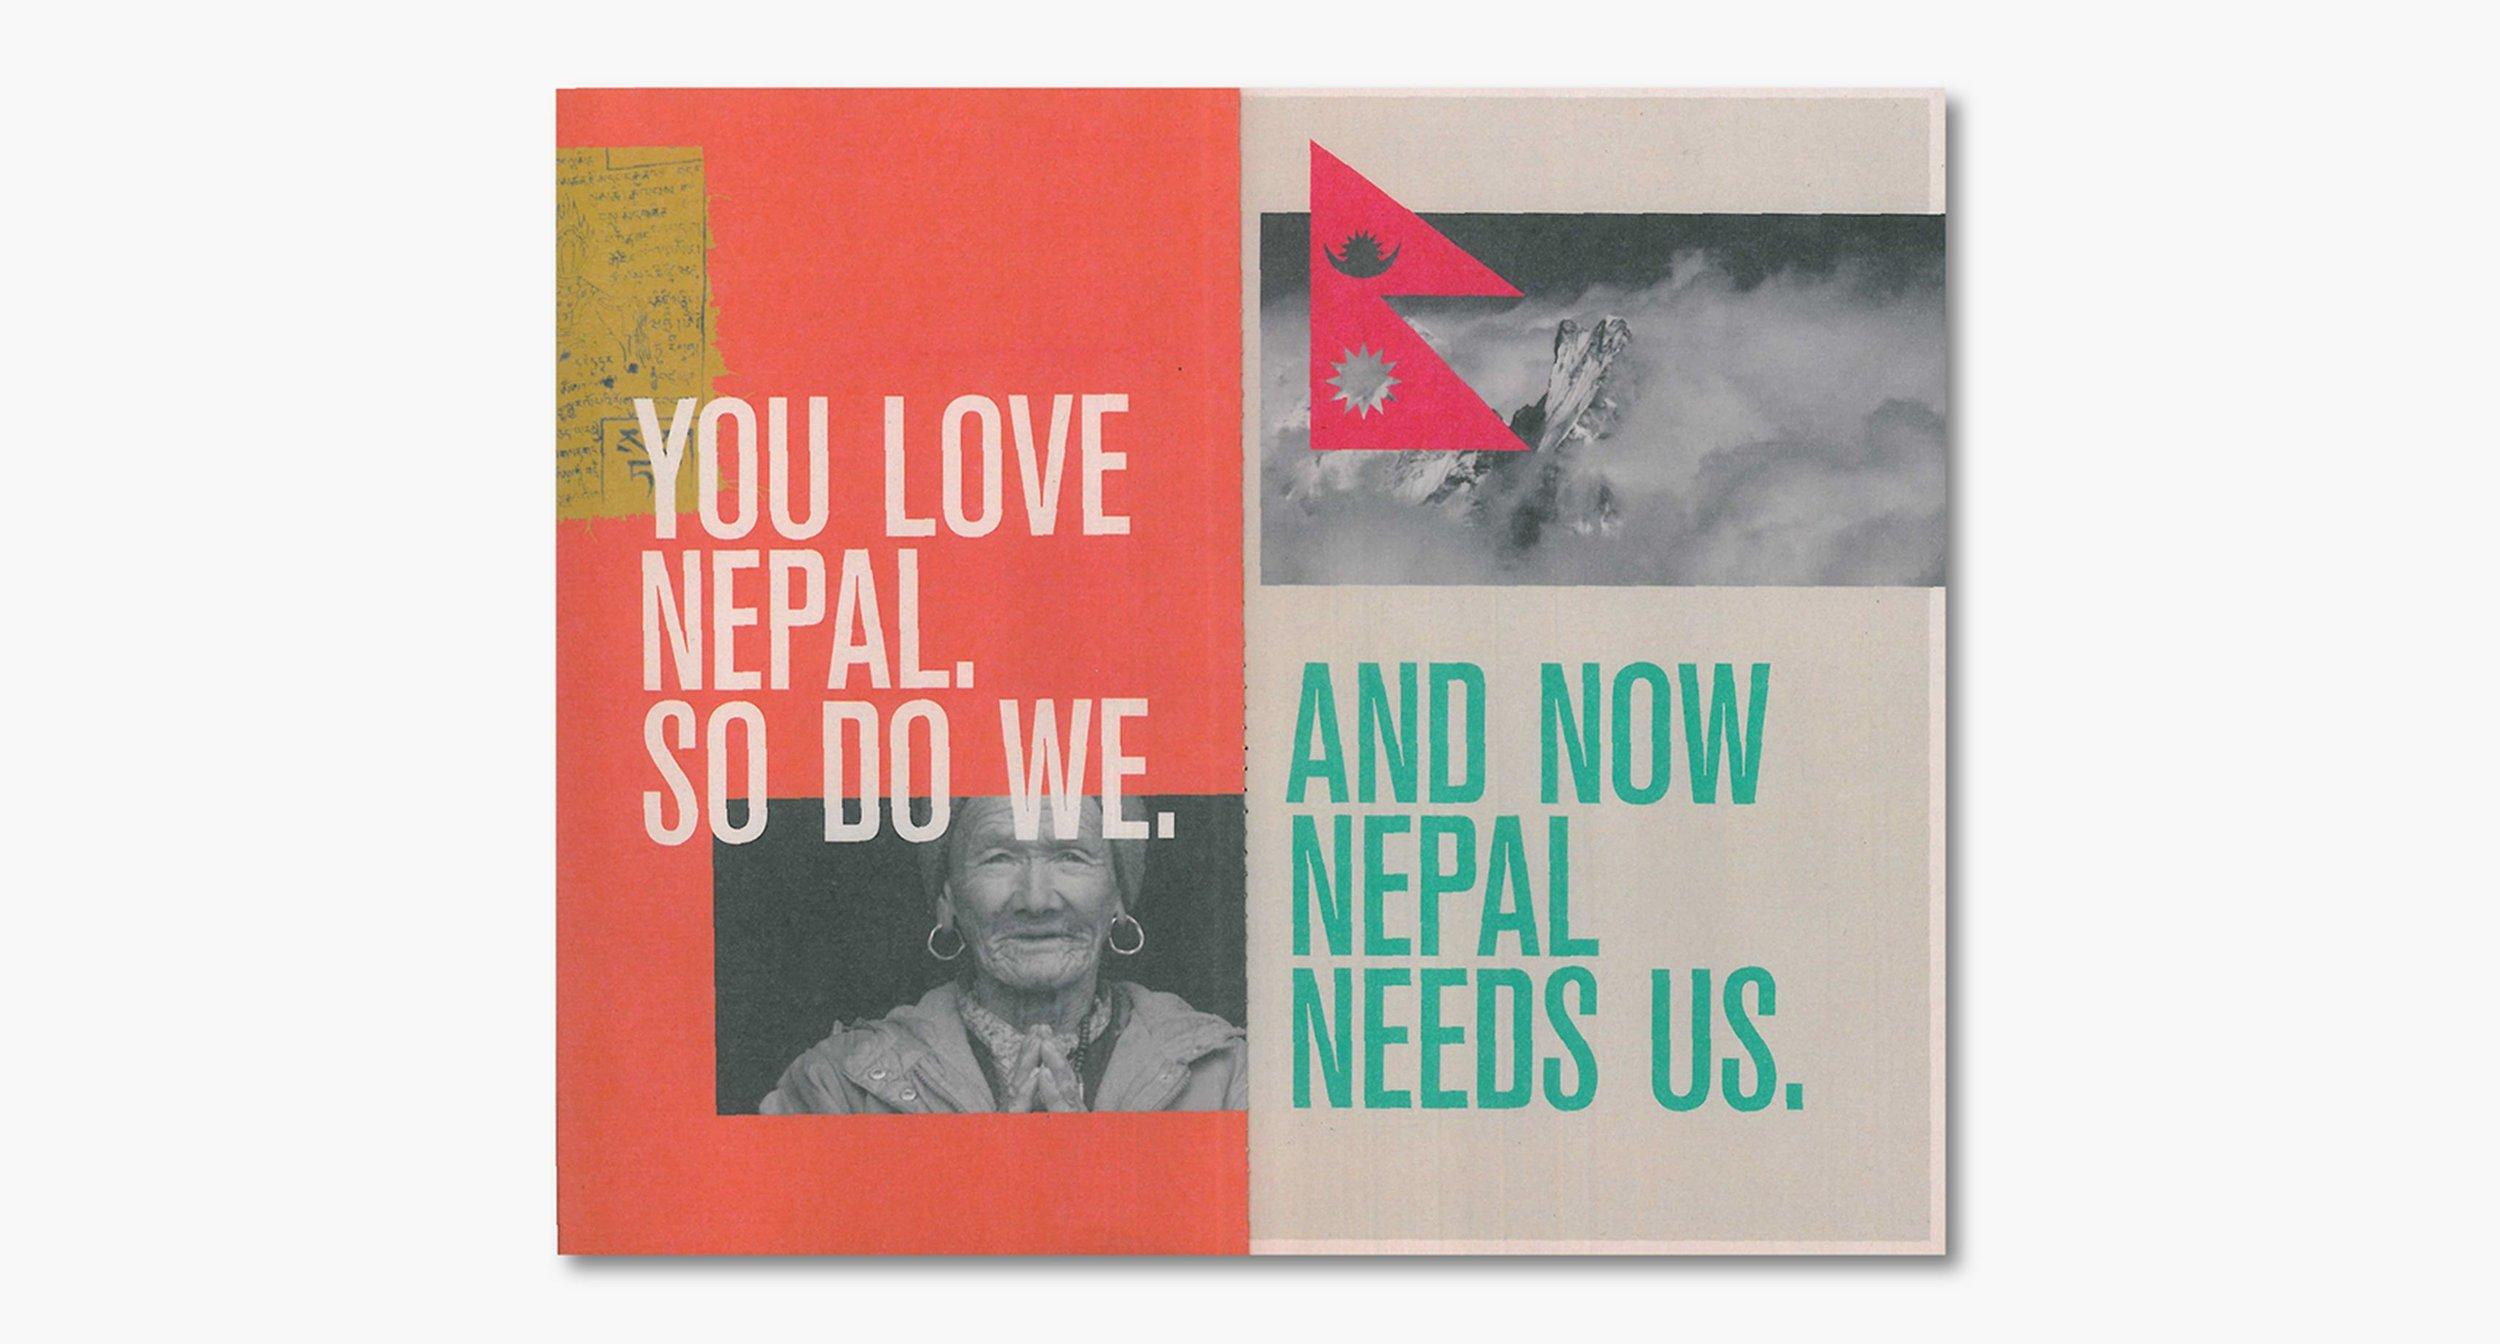 Inside Influencer Material You Love Nepal